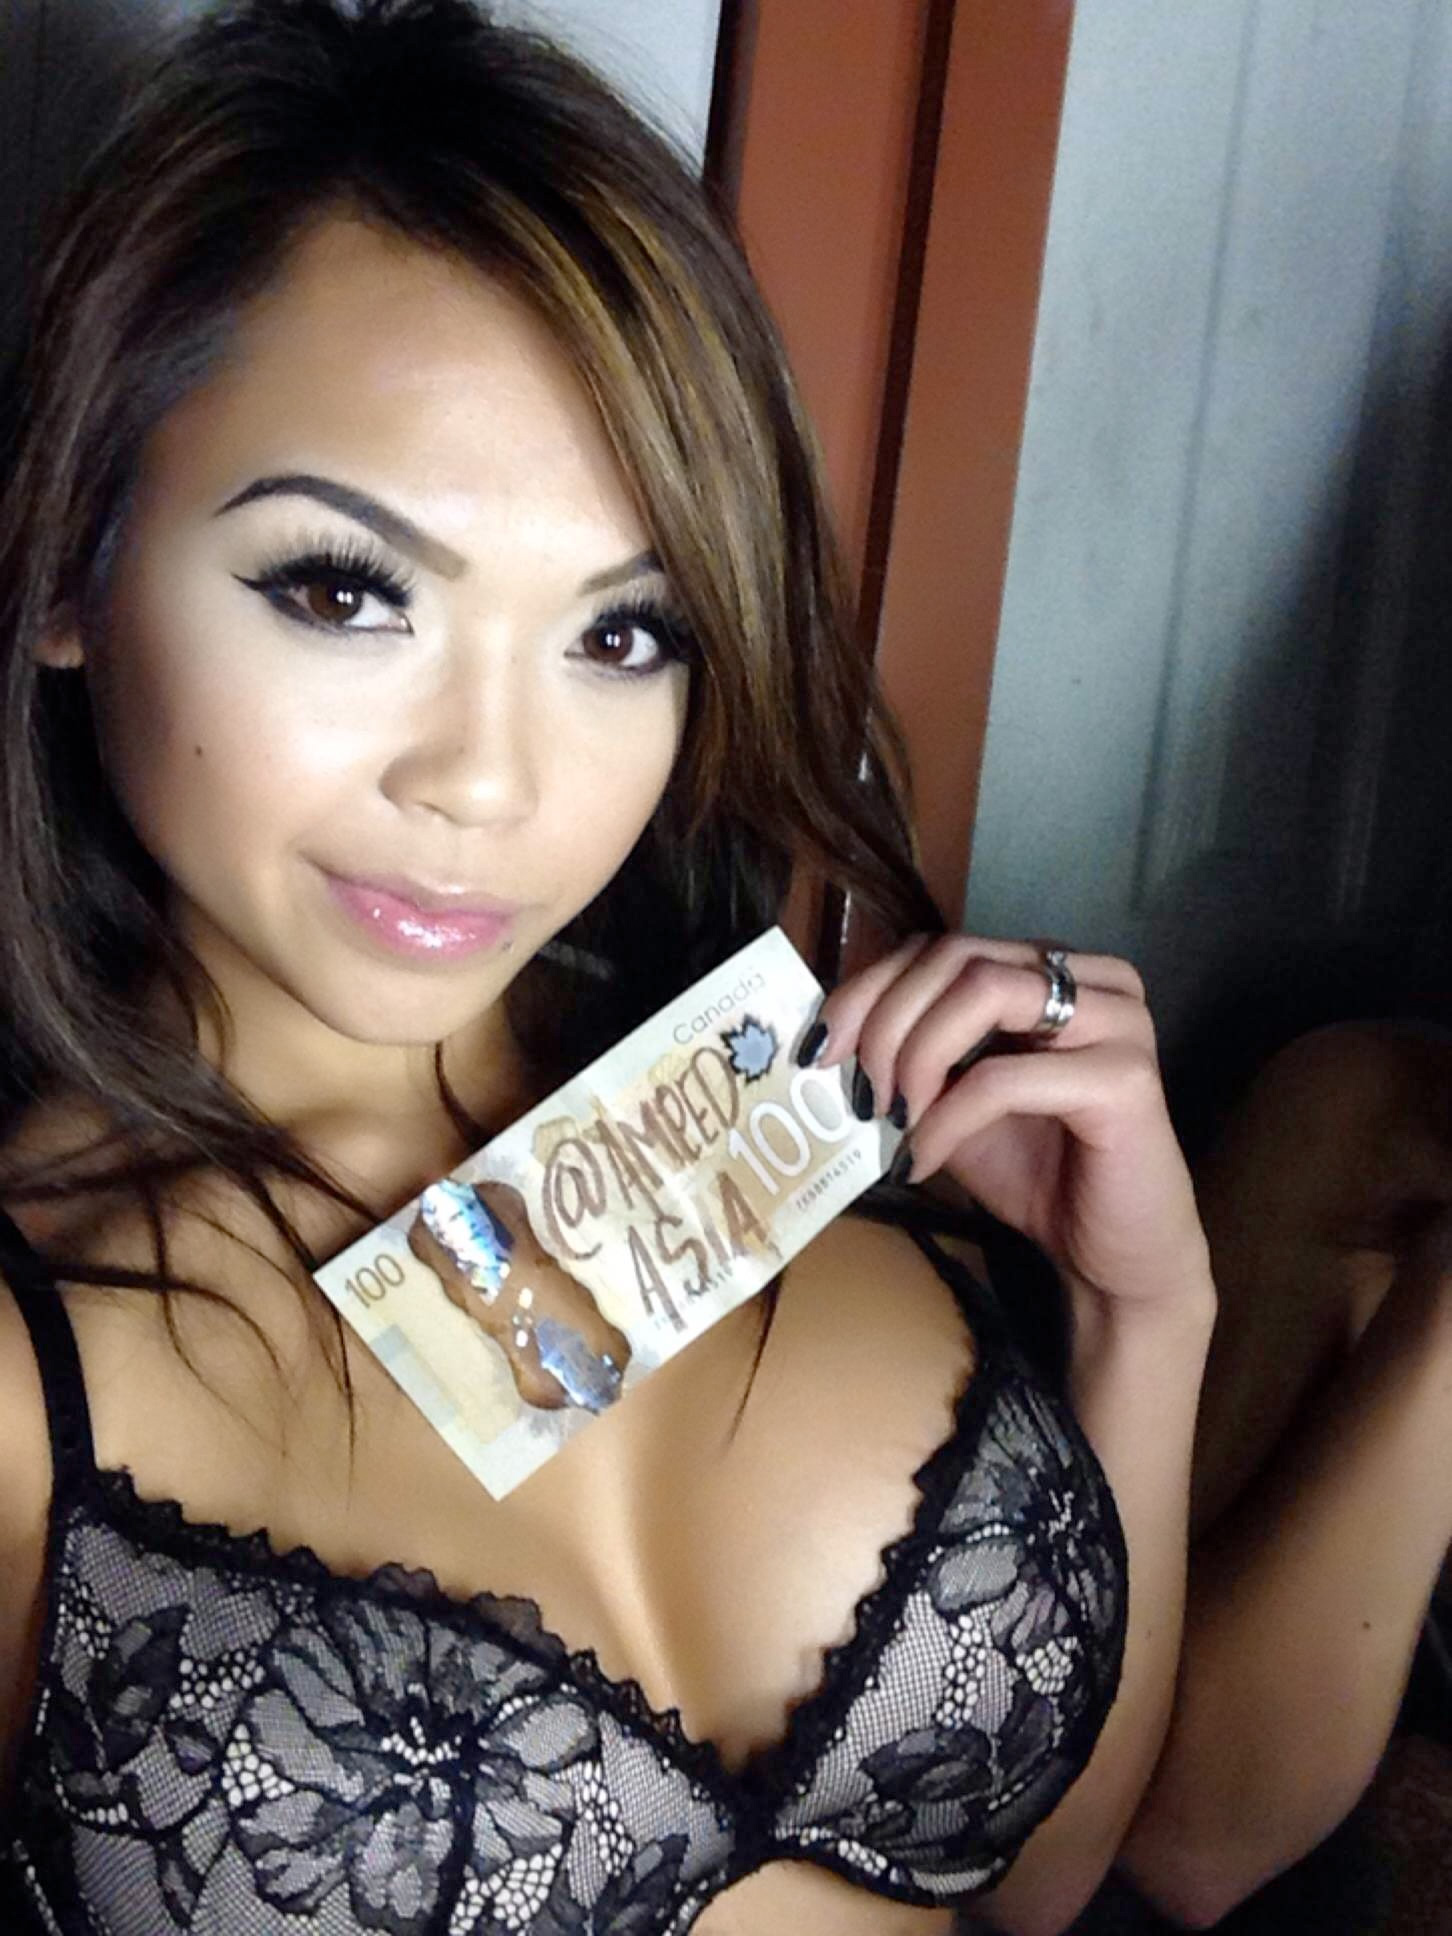 Male strippers japan ol